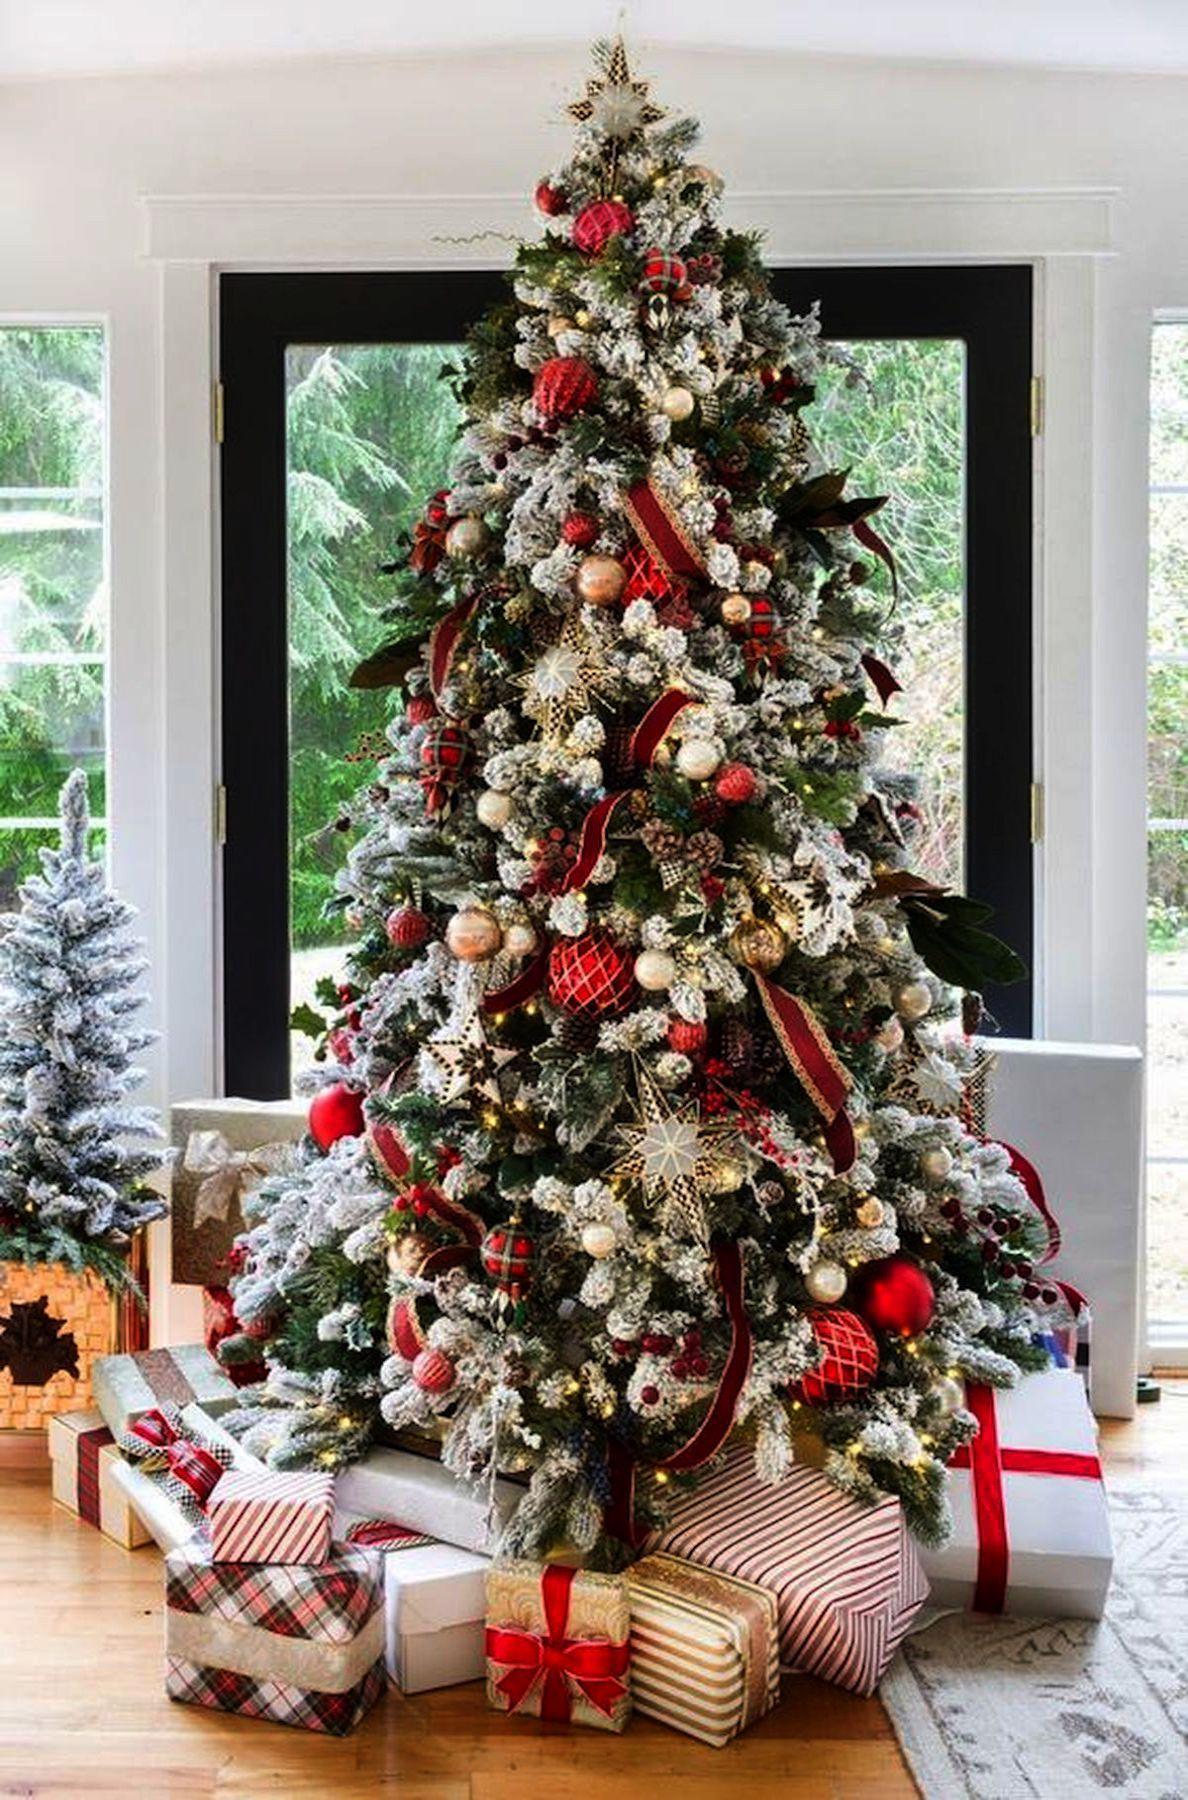 Christmas Island Stamps Christmas Decorations Sale Clearance The Range Classic Christmas Tree Elegant Christmas Decor Traditional Christmas Tree